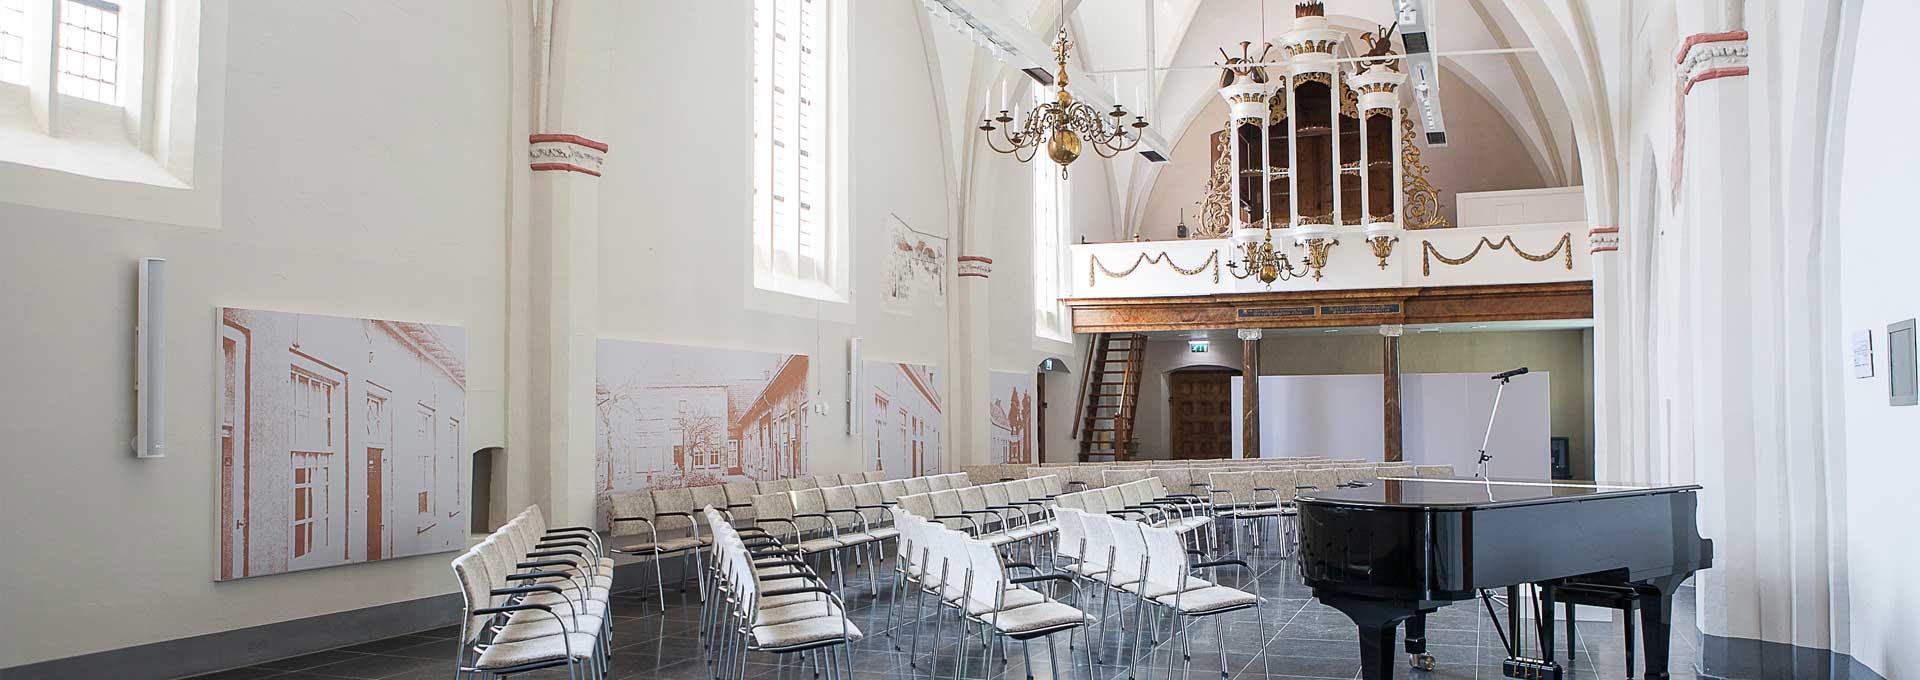 Hospitalskirche Doesburg